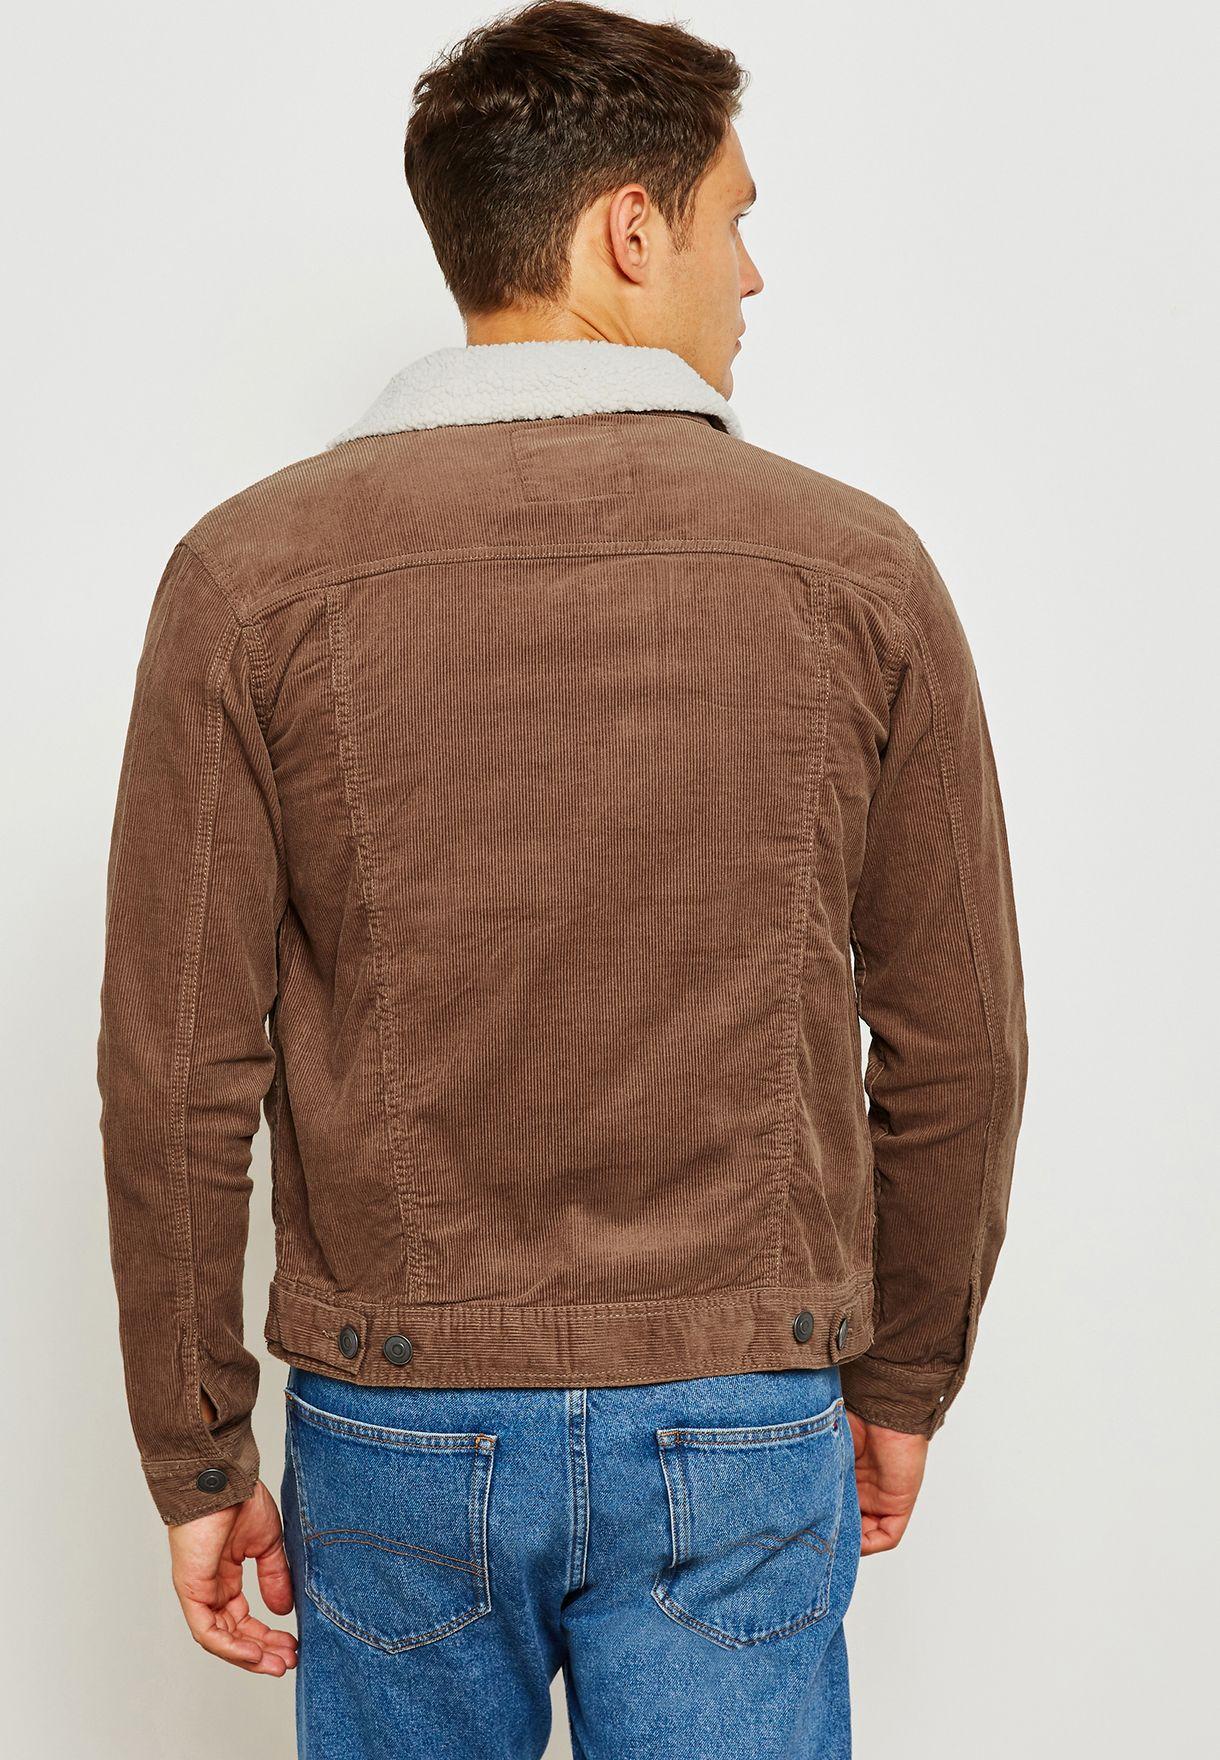 Cord Denim Jacket